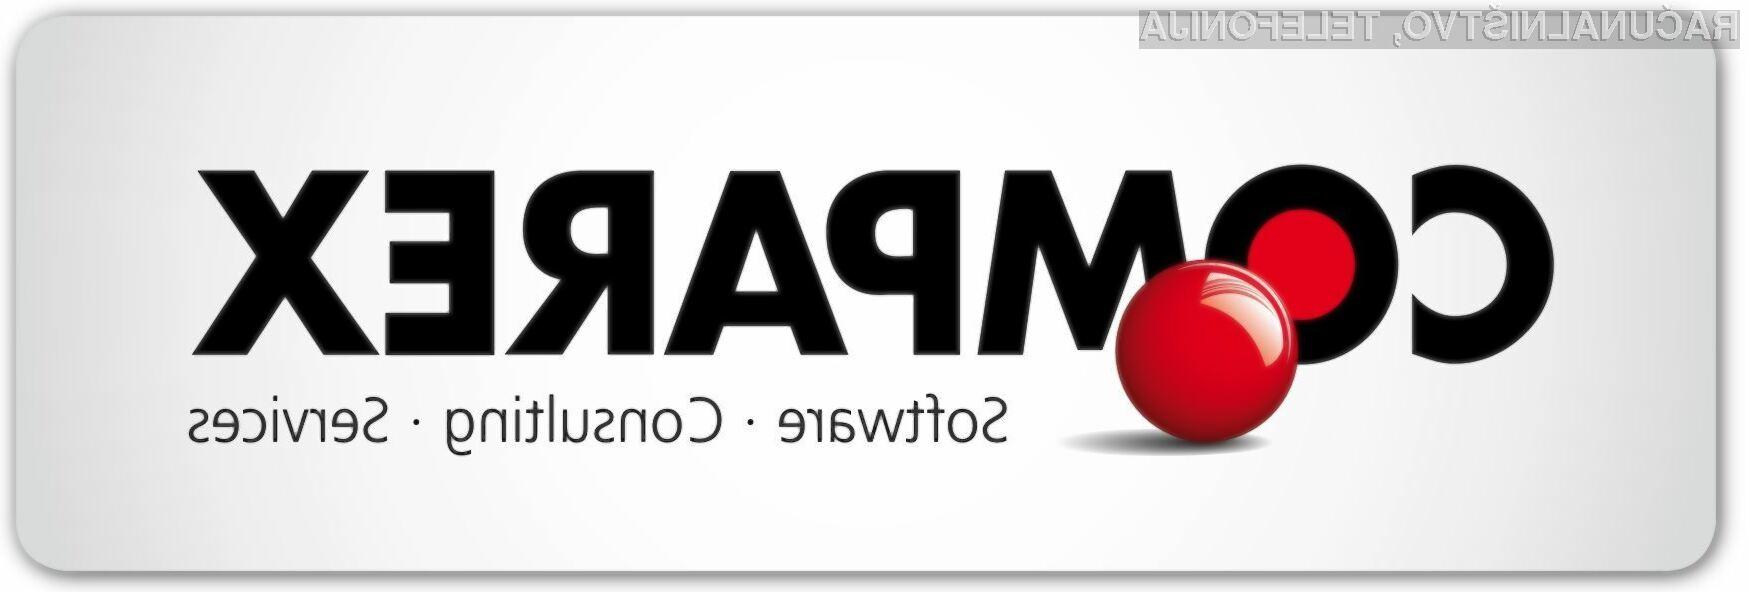 comparex_logo_racunalniske_novice.jpg